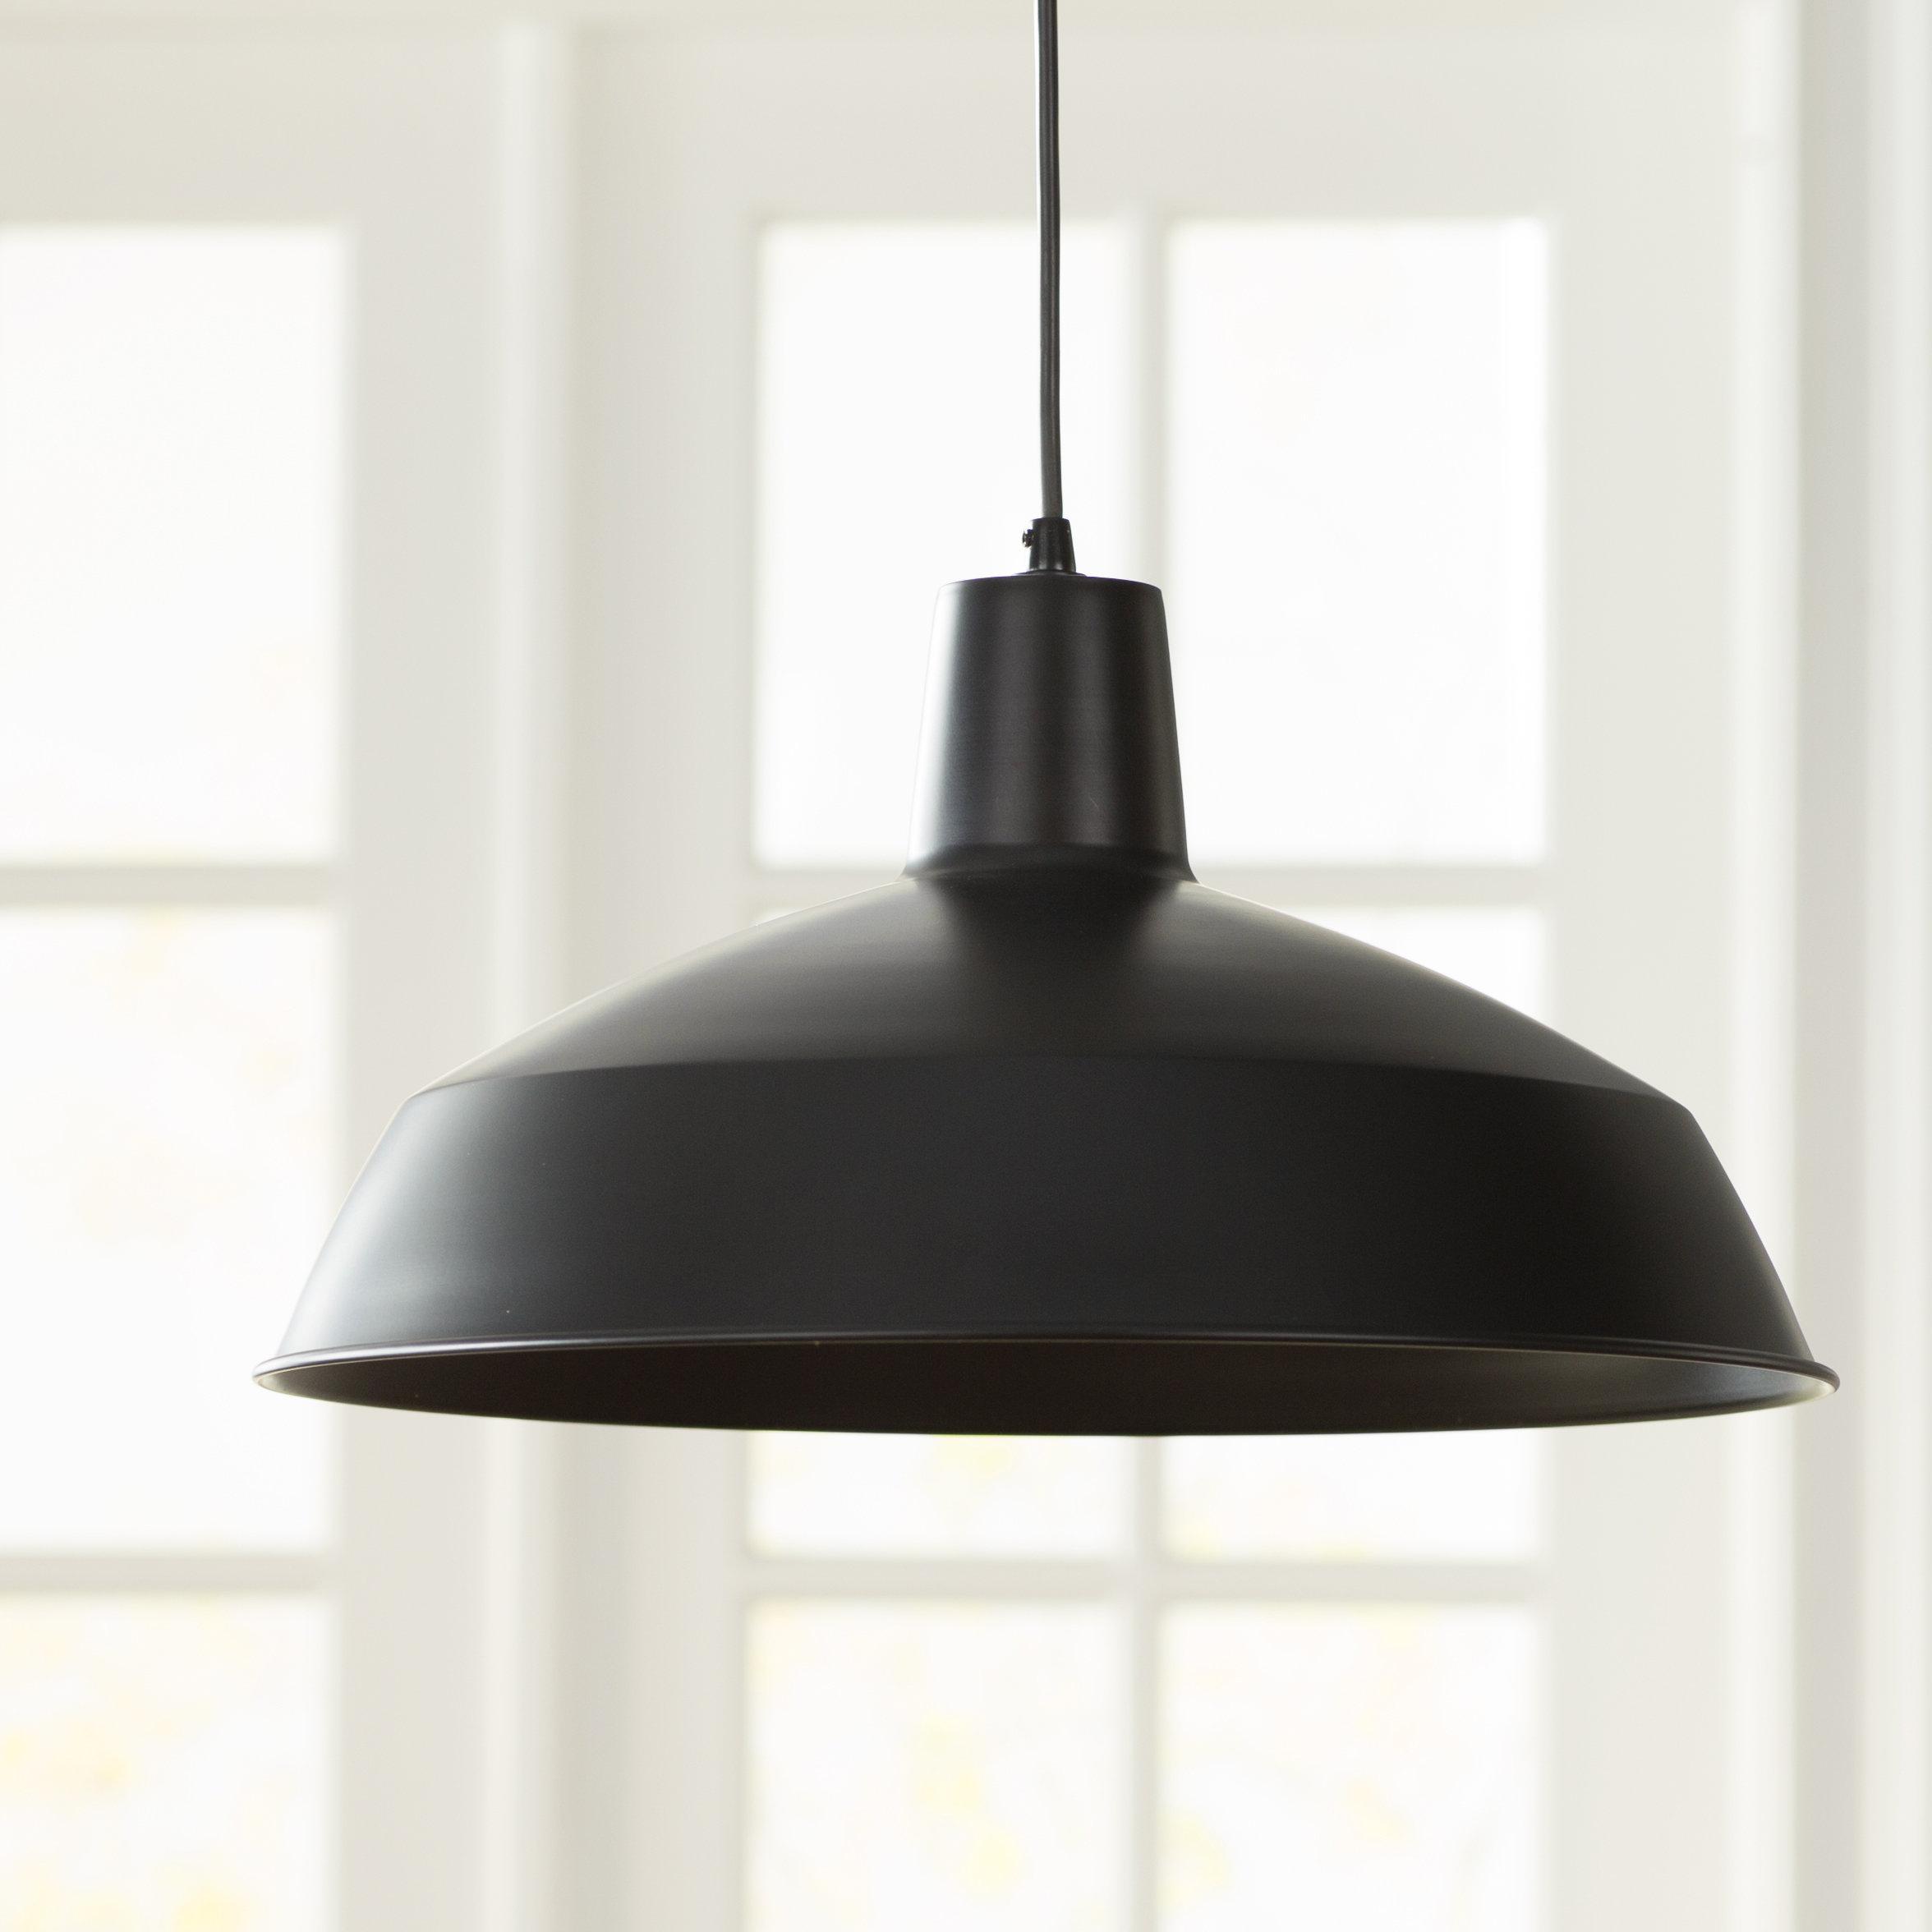 Wayfair Inside 2019 Monadnock 1 Light Single Dome Pendants (View 23 of 25)